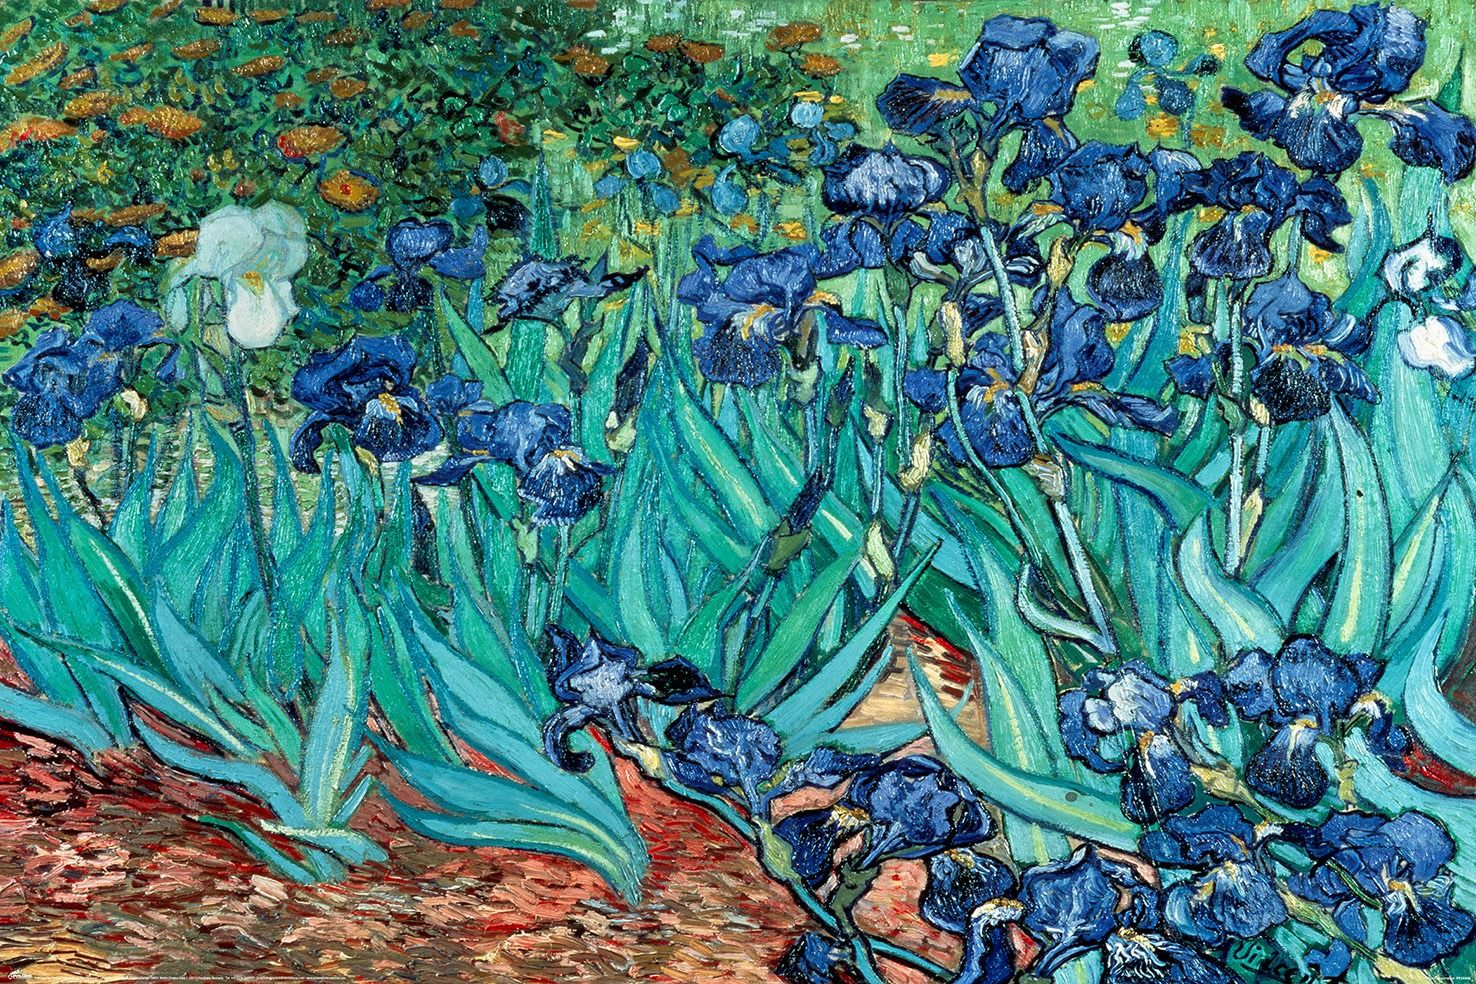 Vincent van gogh irysy - plakat